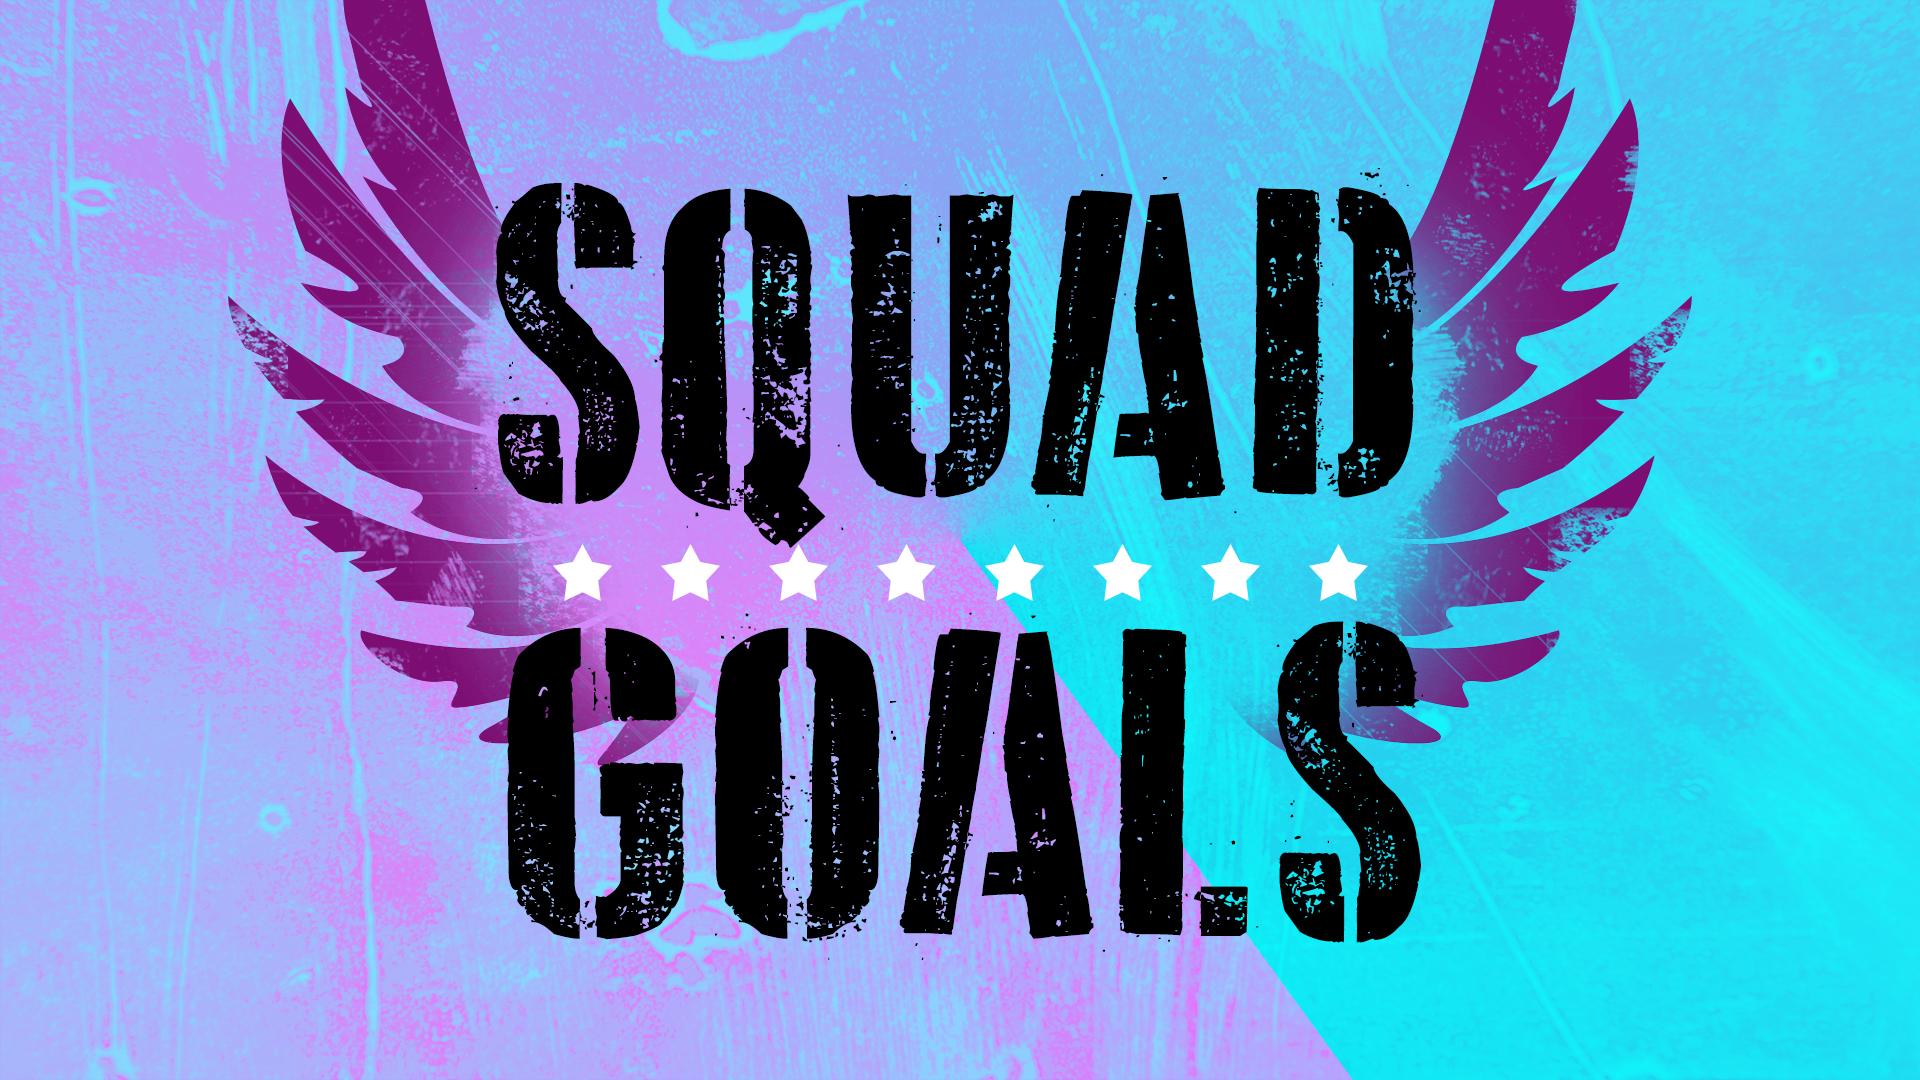 Squad Goals SCREEN.jpg